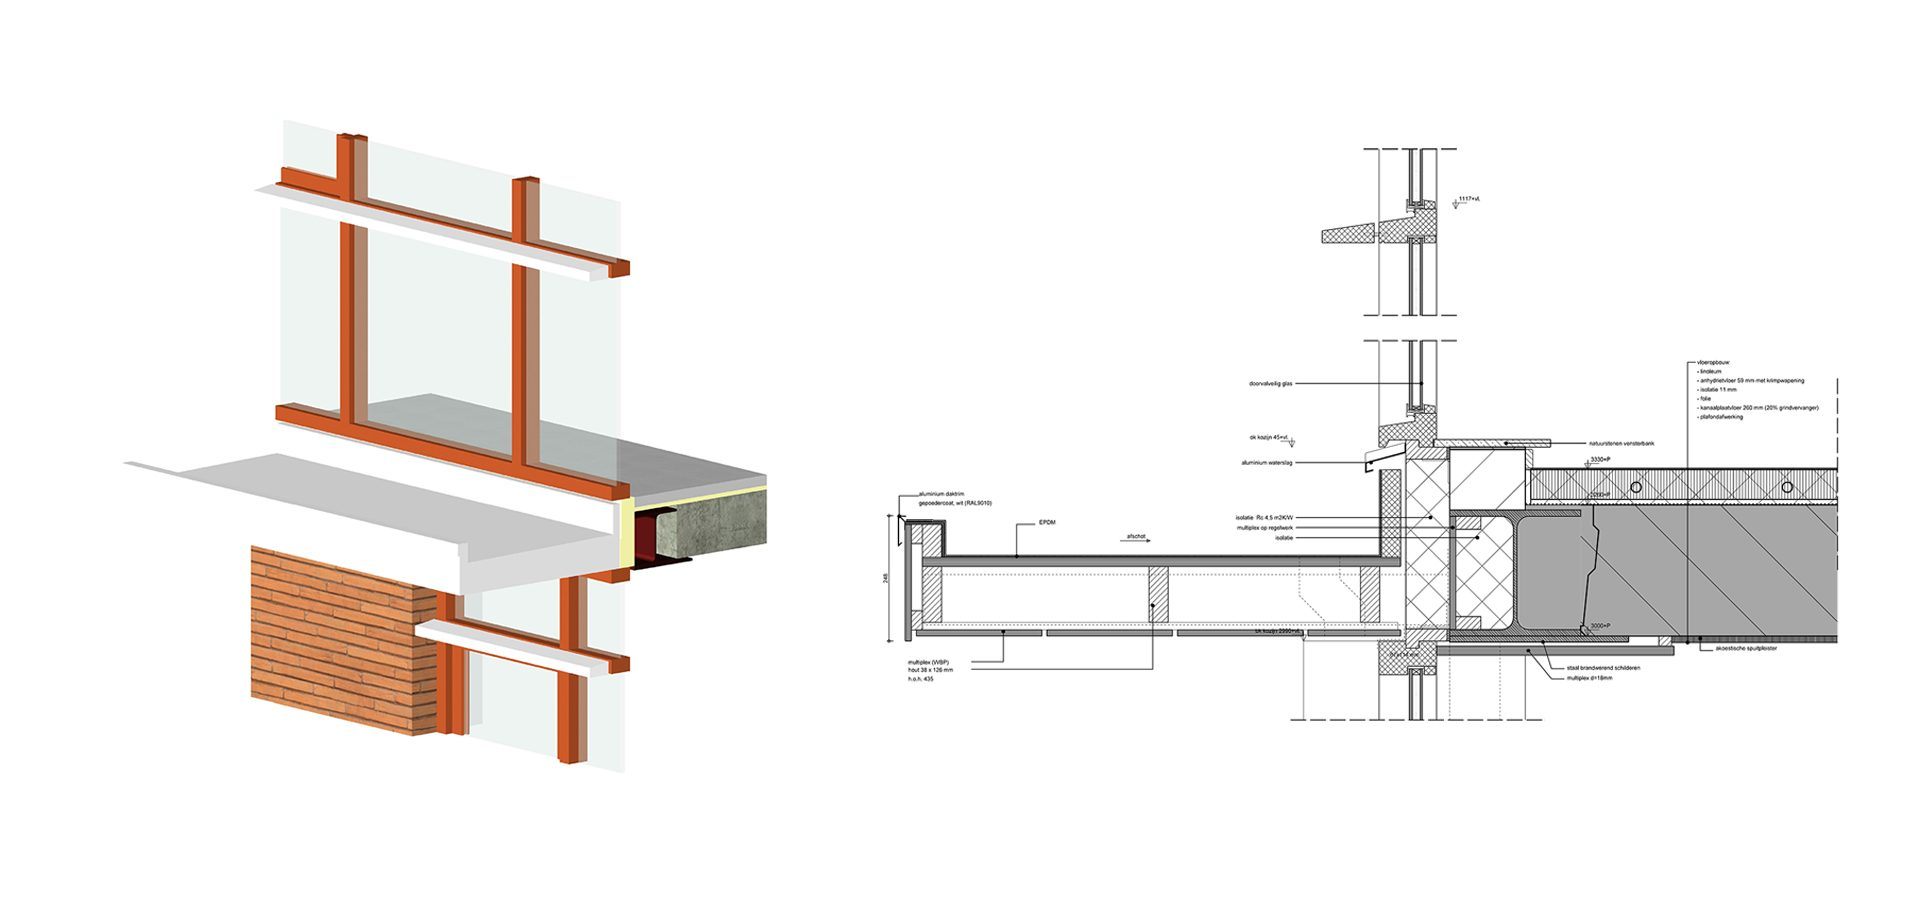 FARO architecten Dorpshuis Badhoevedorp Detail